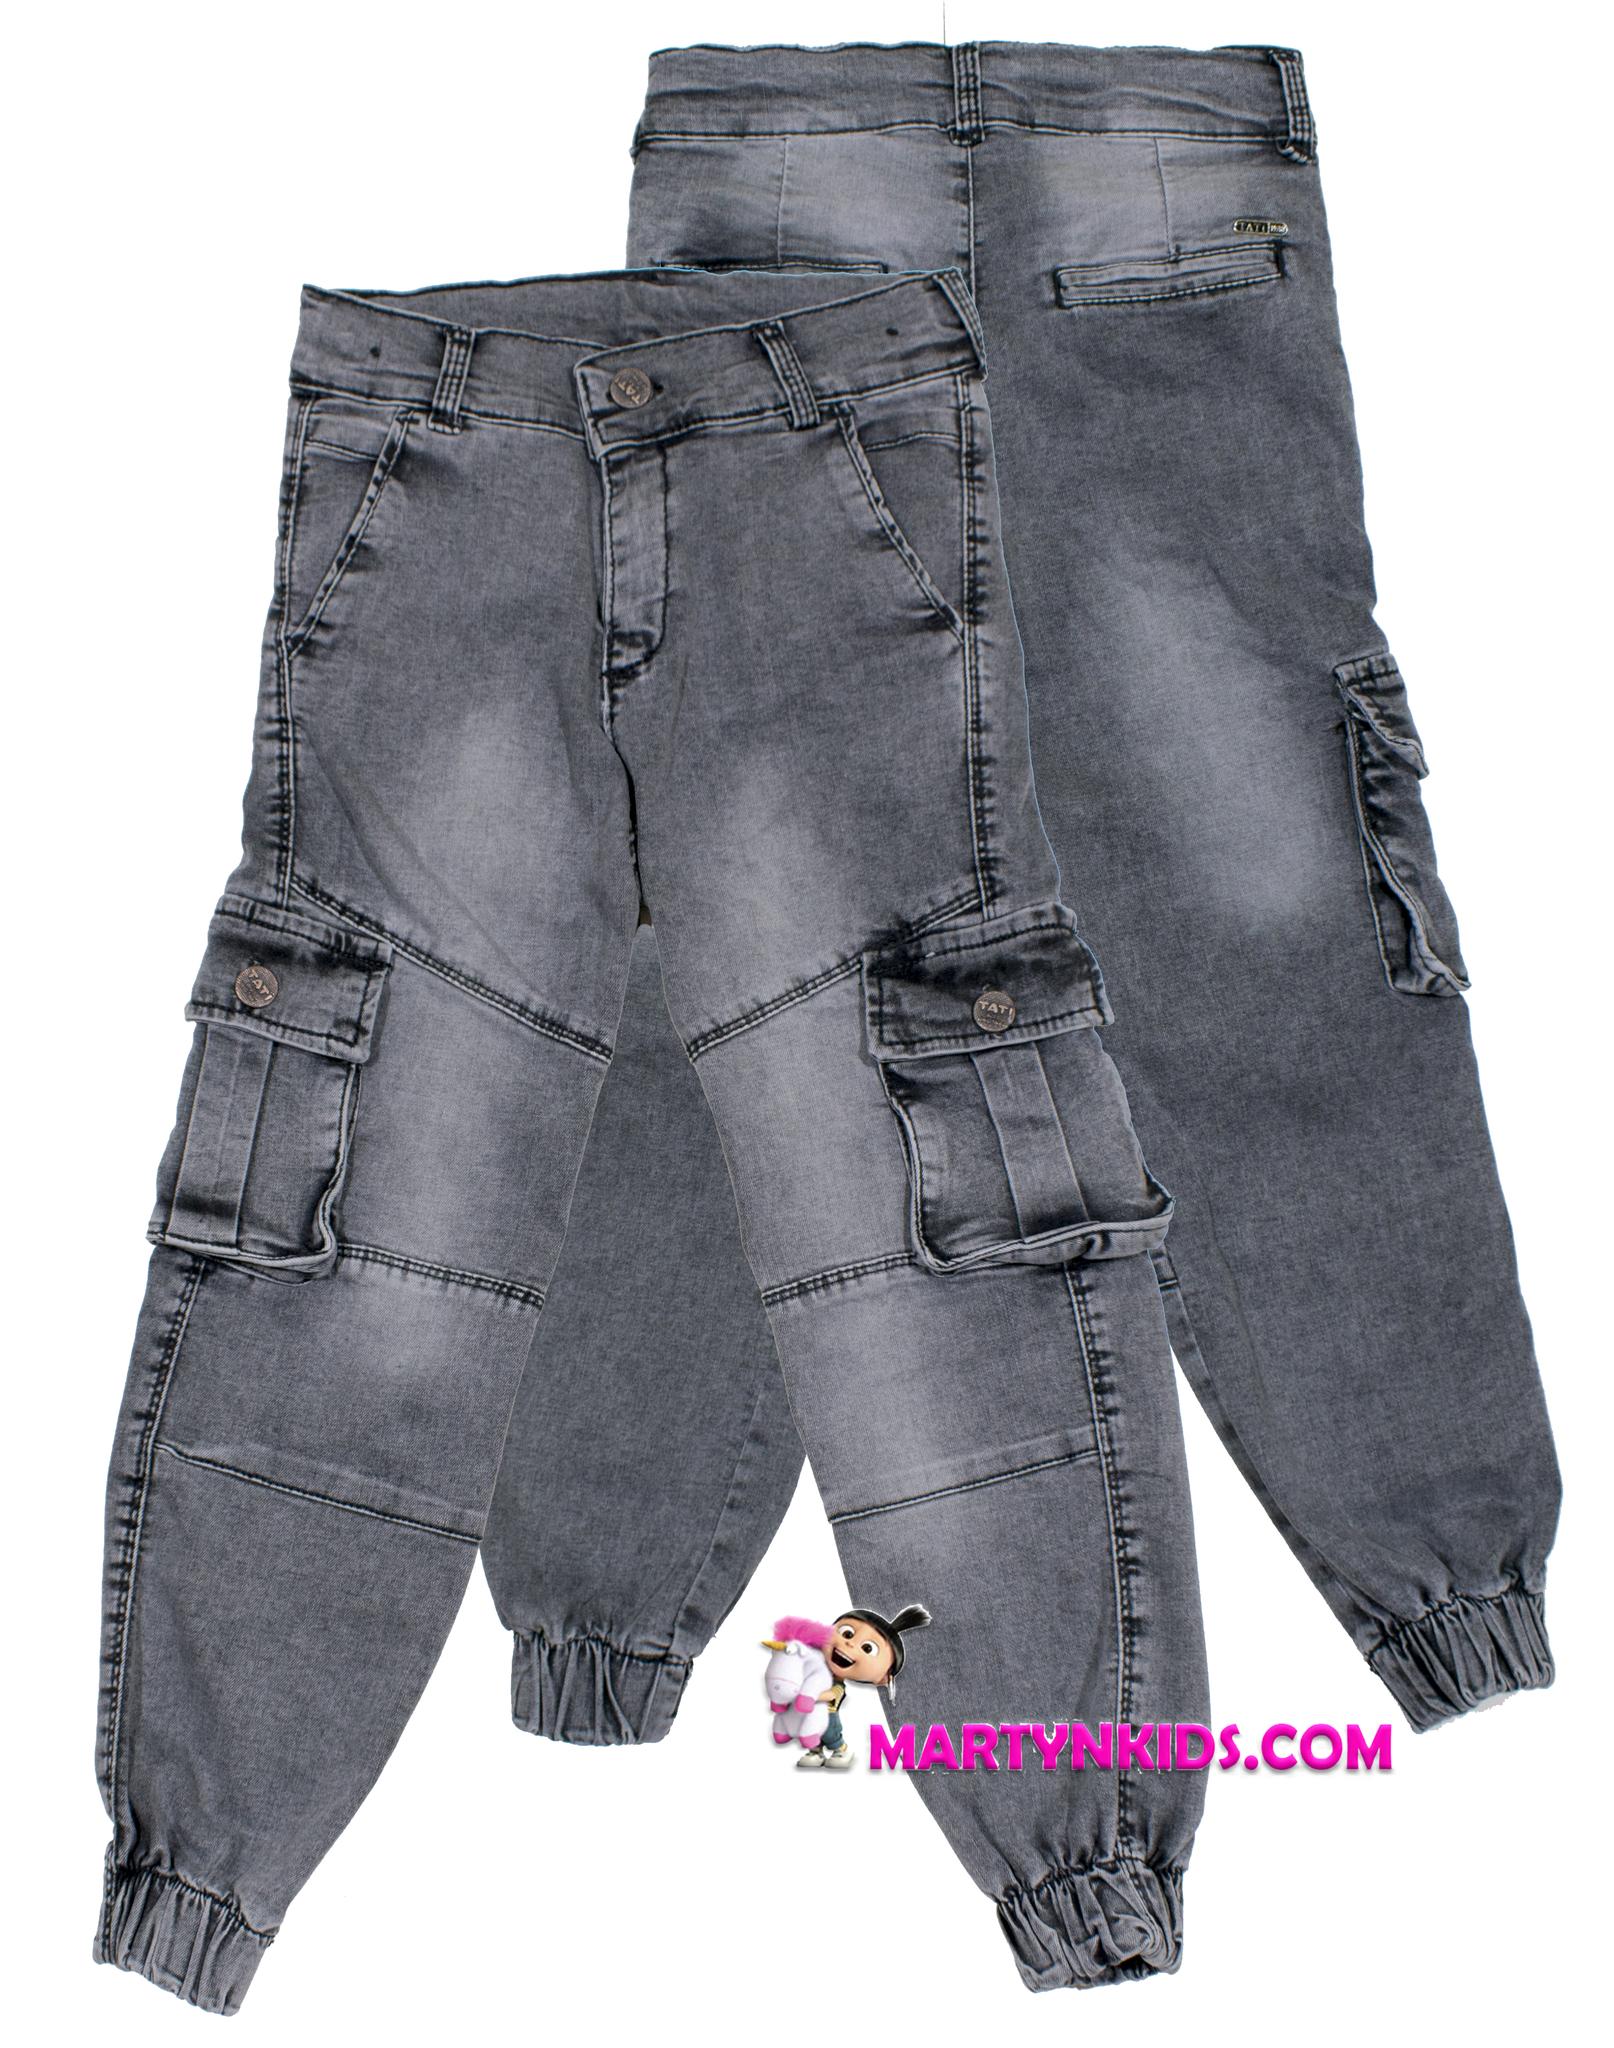 1301 джинсы джоггеры накладной карман 2